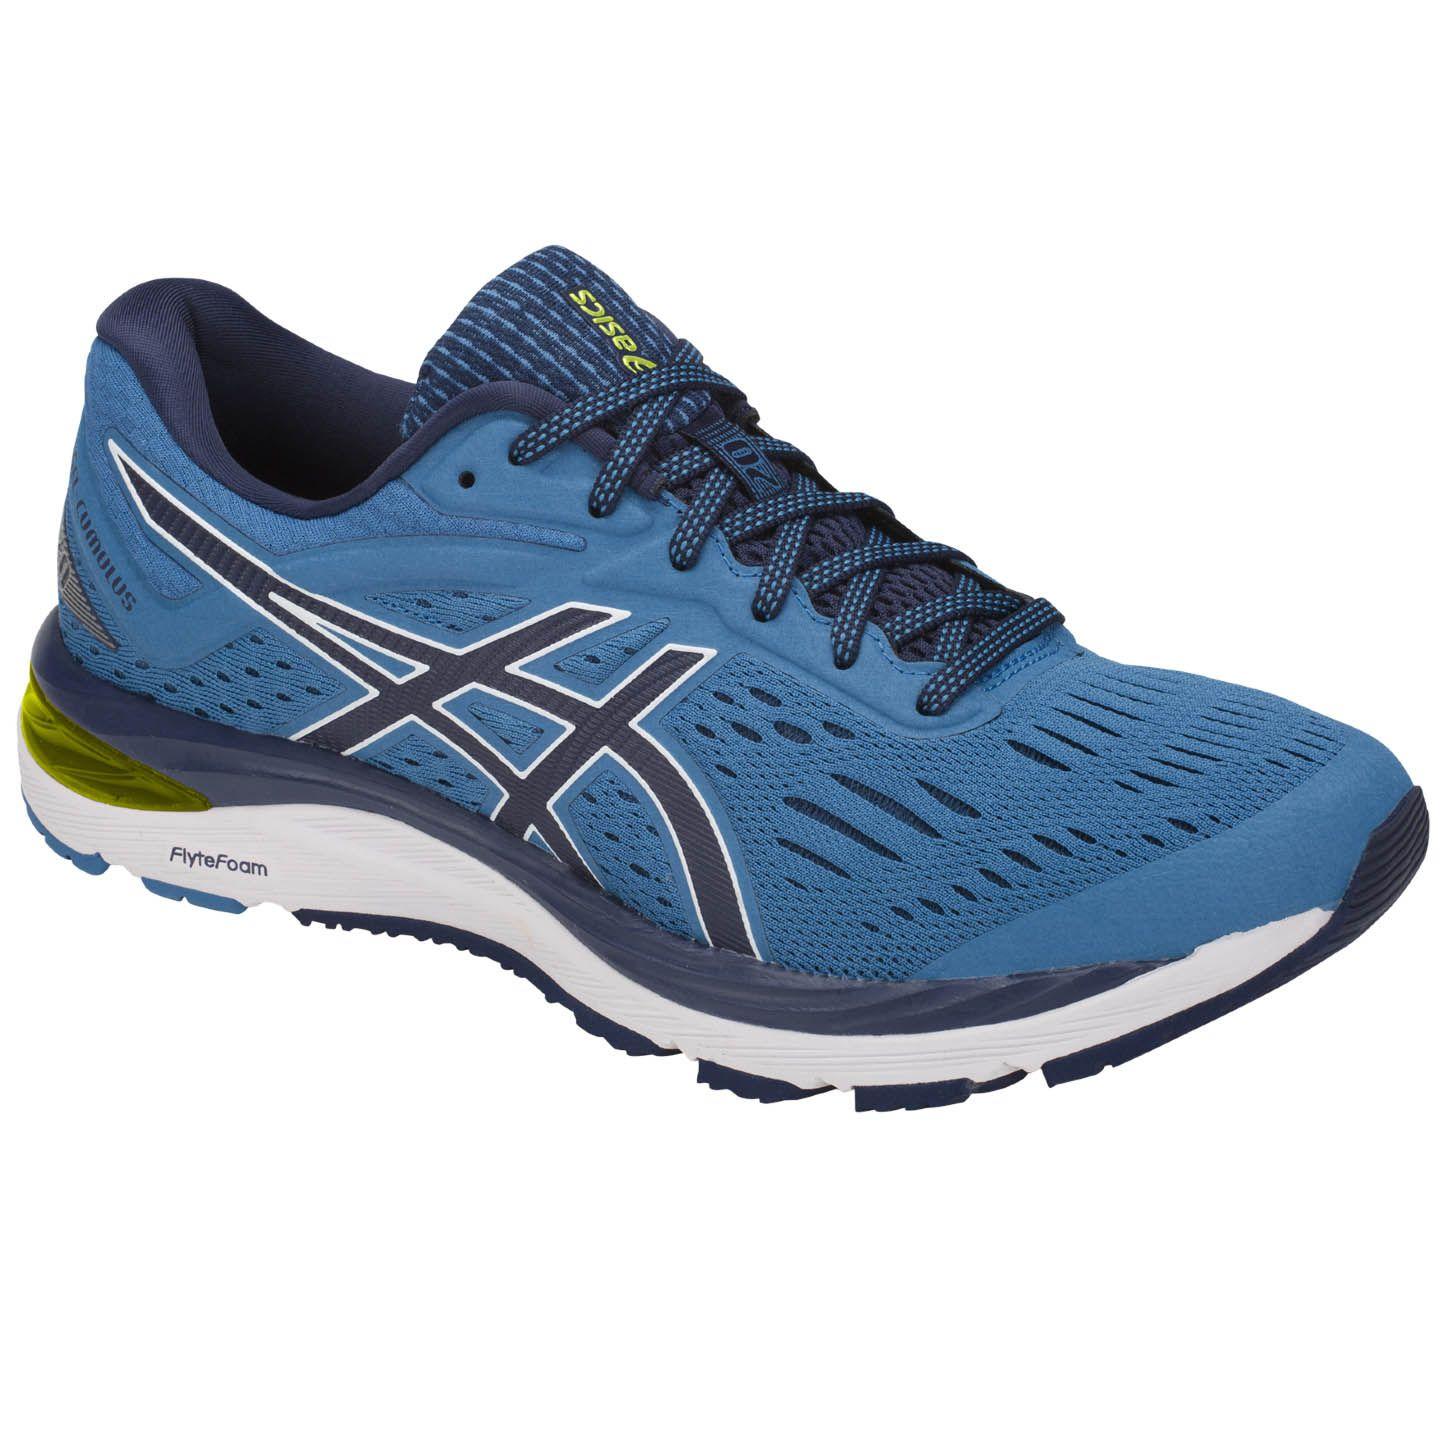 Asics Gel-Cumulus 20 Mens Running Shoes AW18 - Sweatband.com